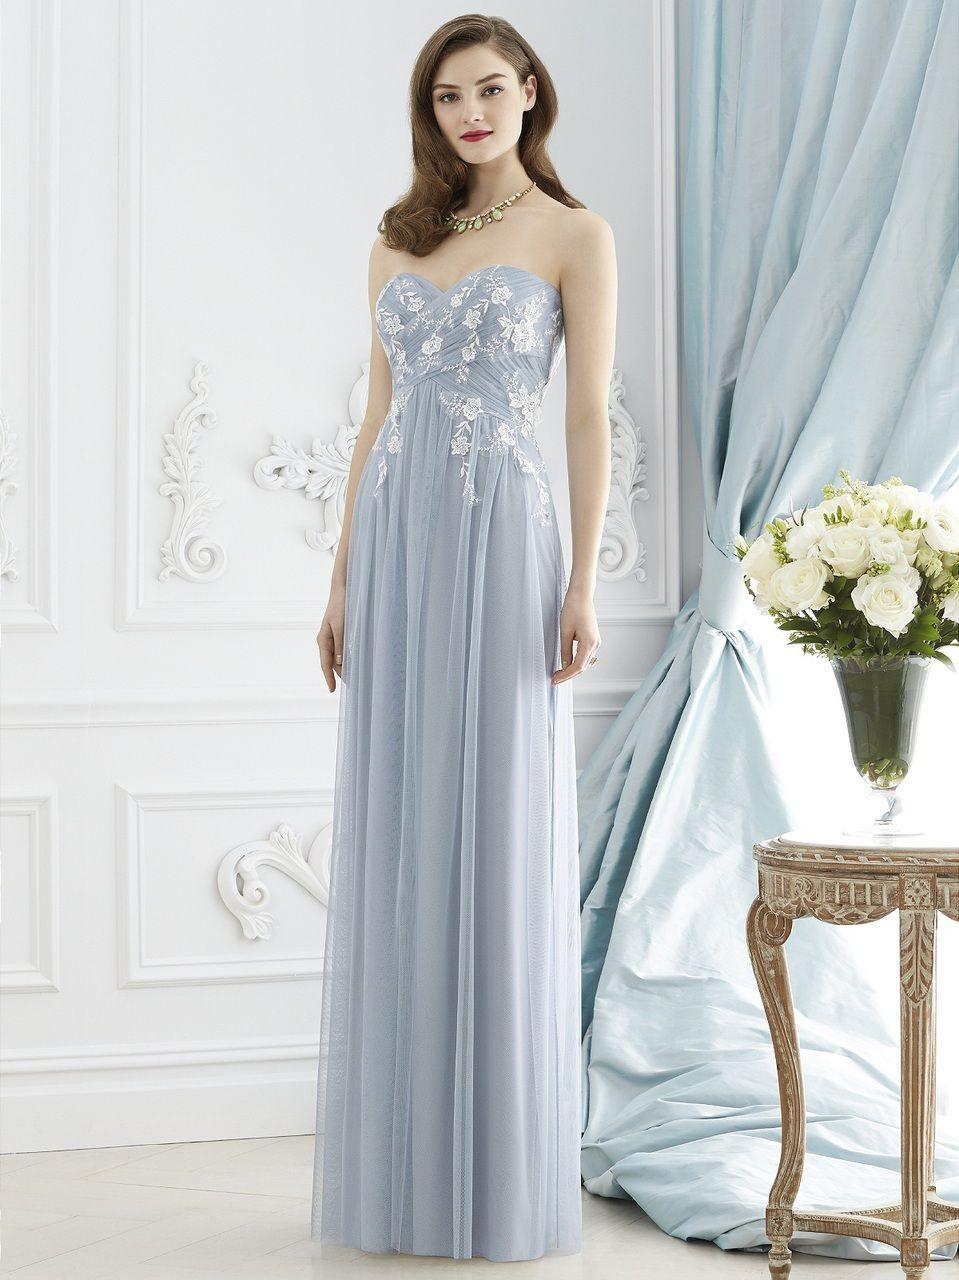 Dessy Collection Bridesmaid Dress Style - 2948 | Blush Bridal ...